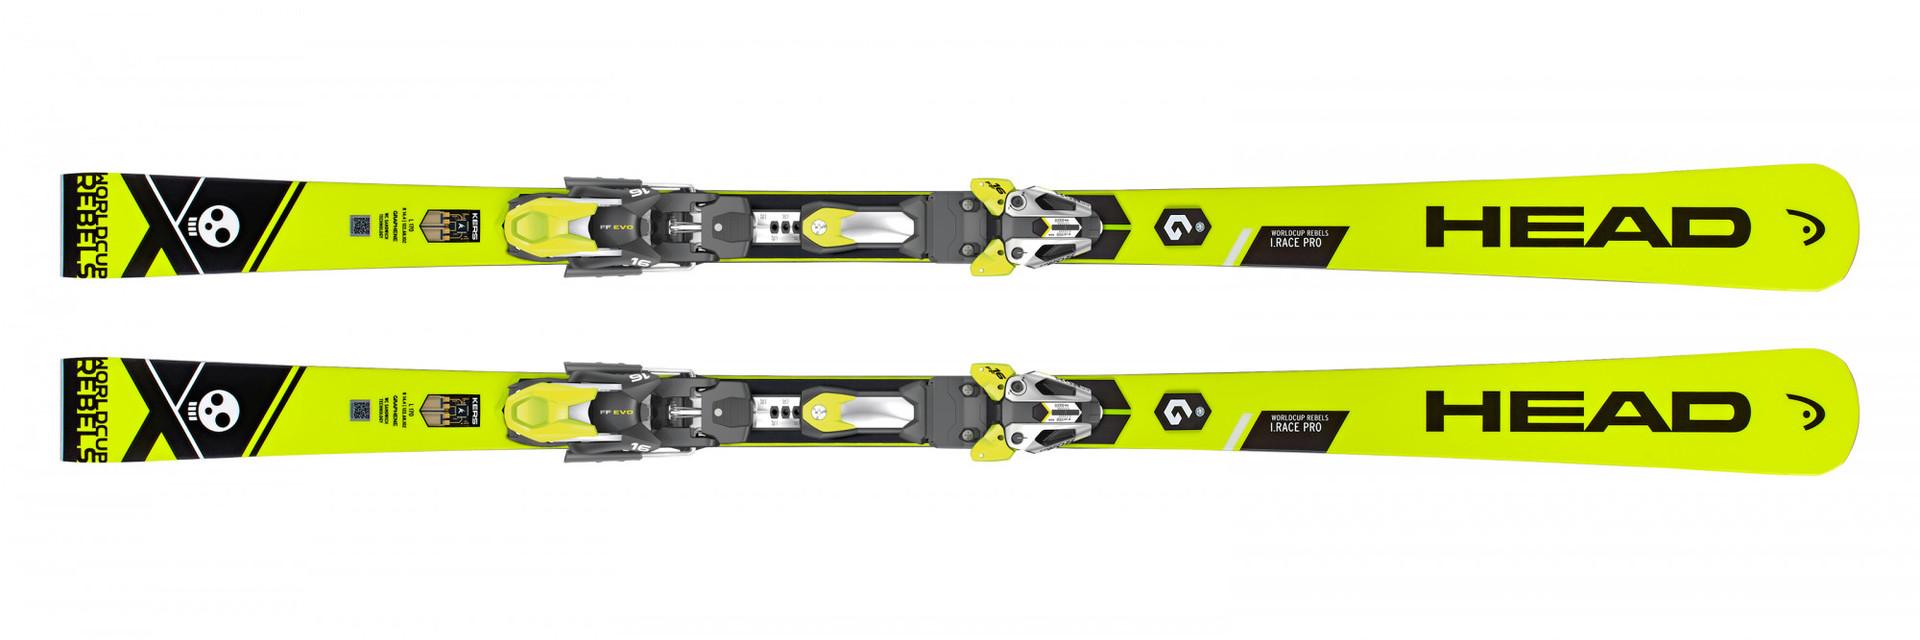 Горные лыжи Head WorldCup Rebels i.Race Pro + Крепление FF EVO 16 размер 170 (2019)